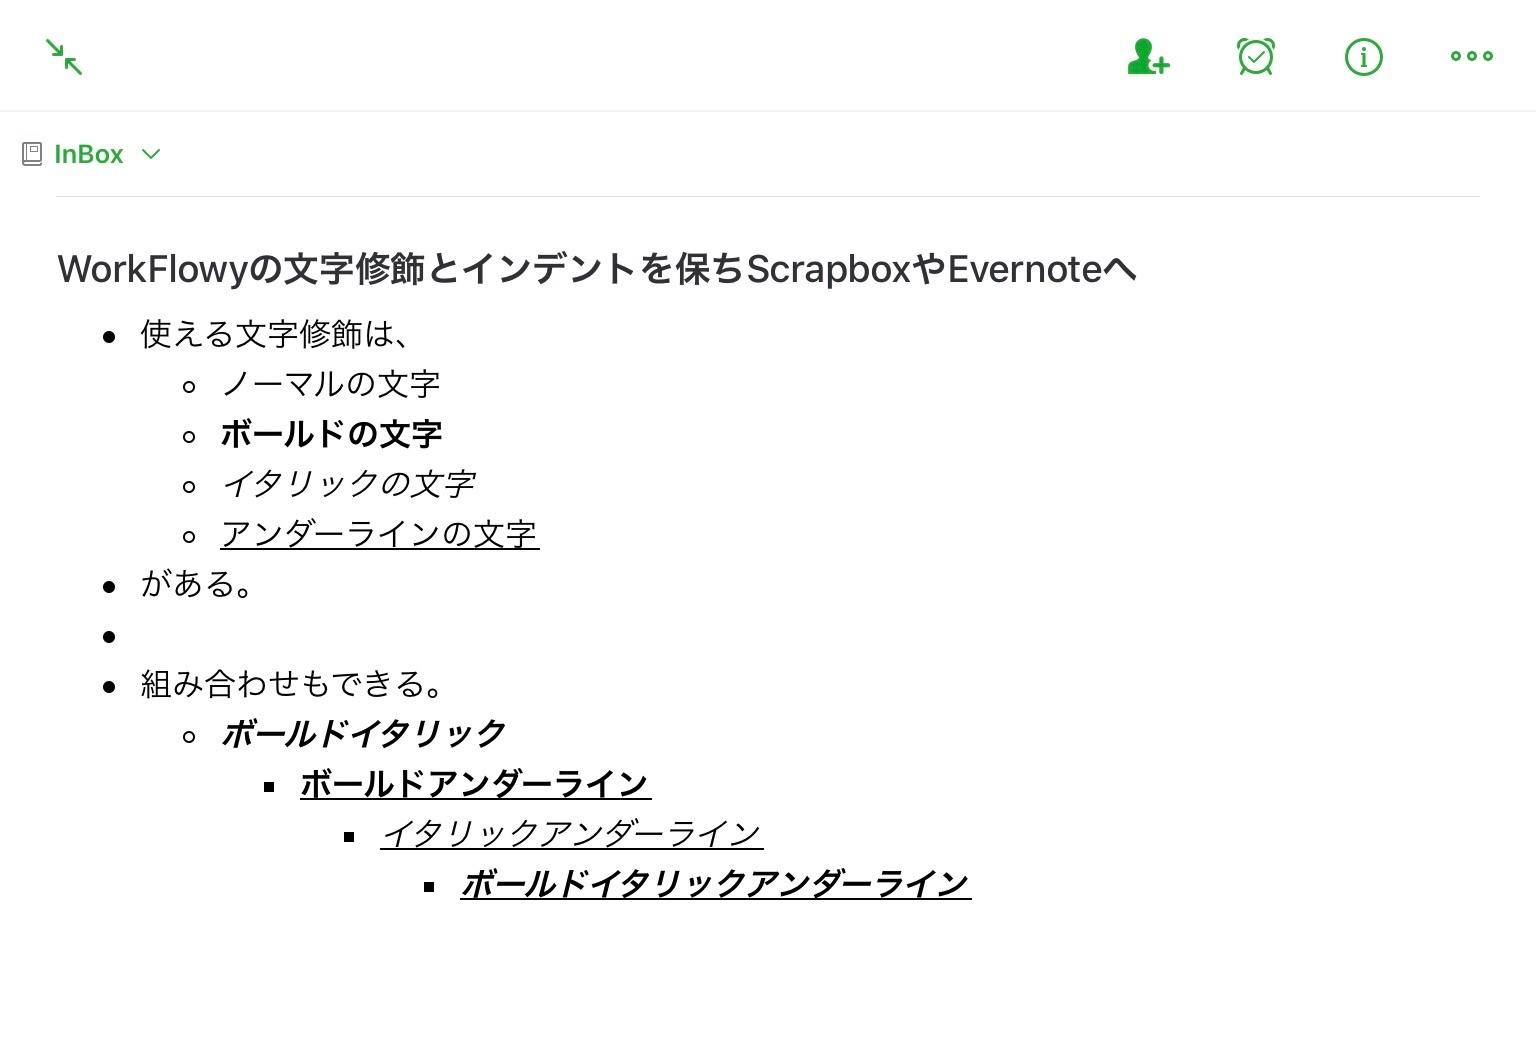 f:id:sorashima:20200801182903j:plain:w637